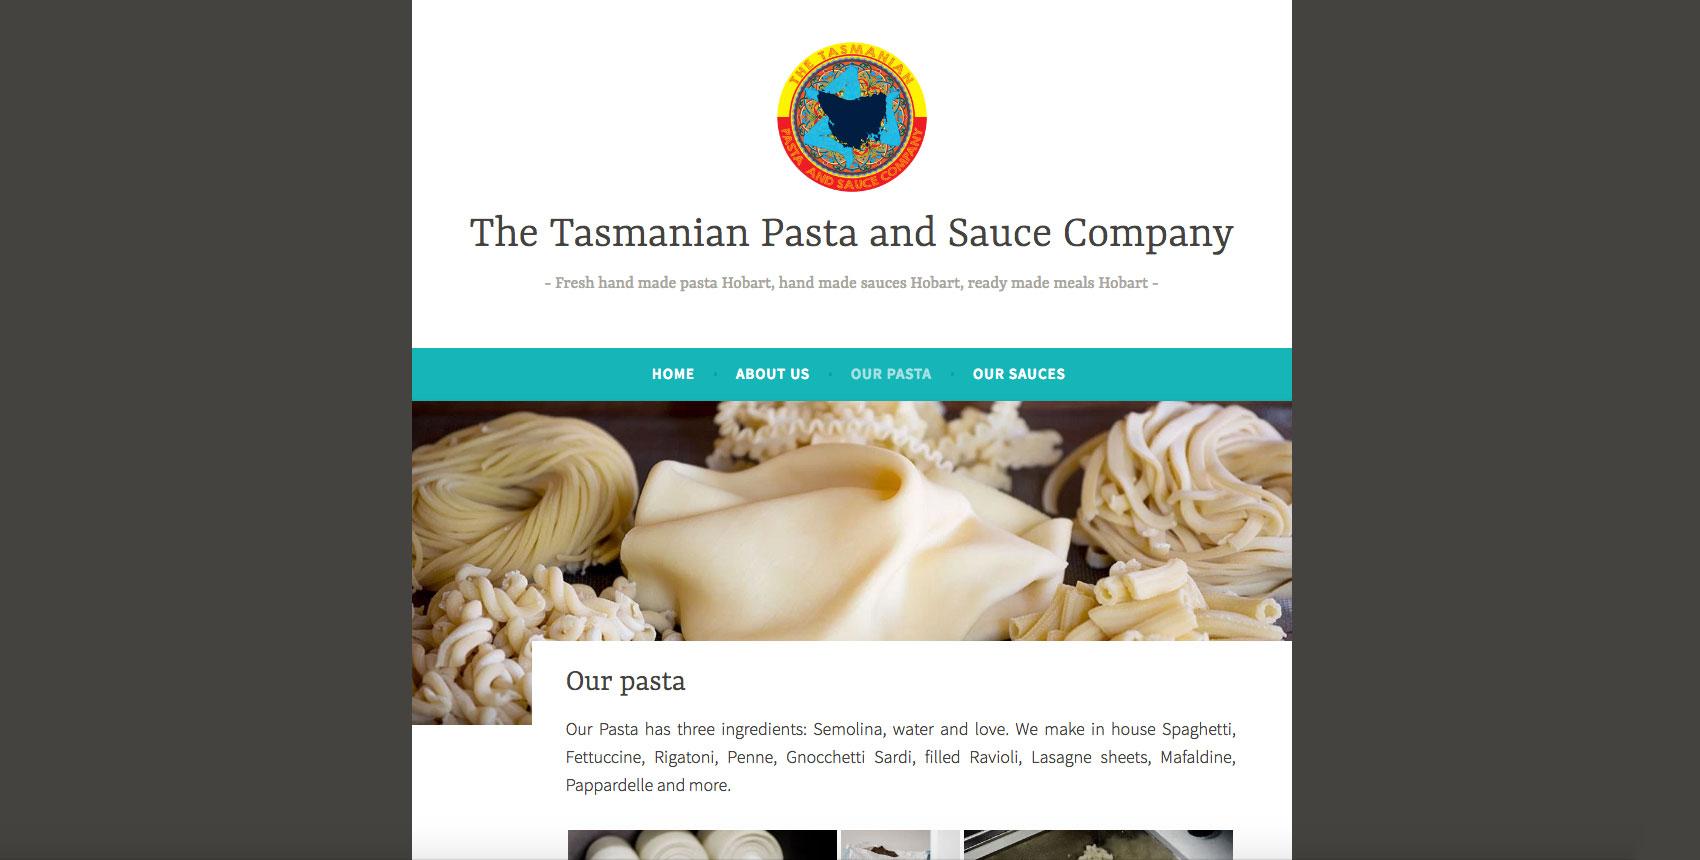 The Tasmanian Pasta and Sauce Company